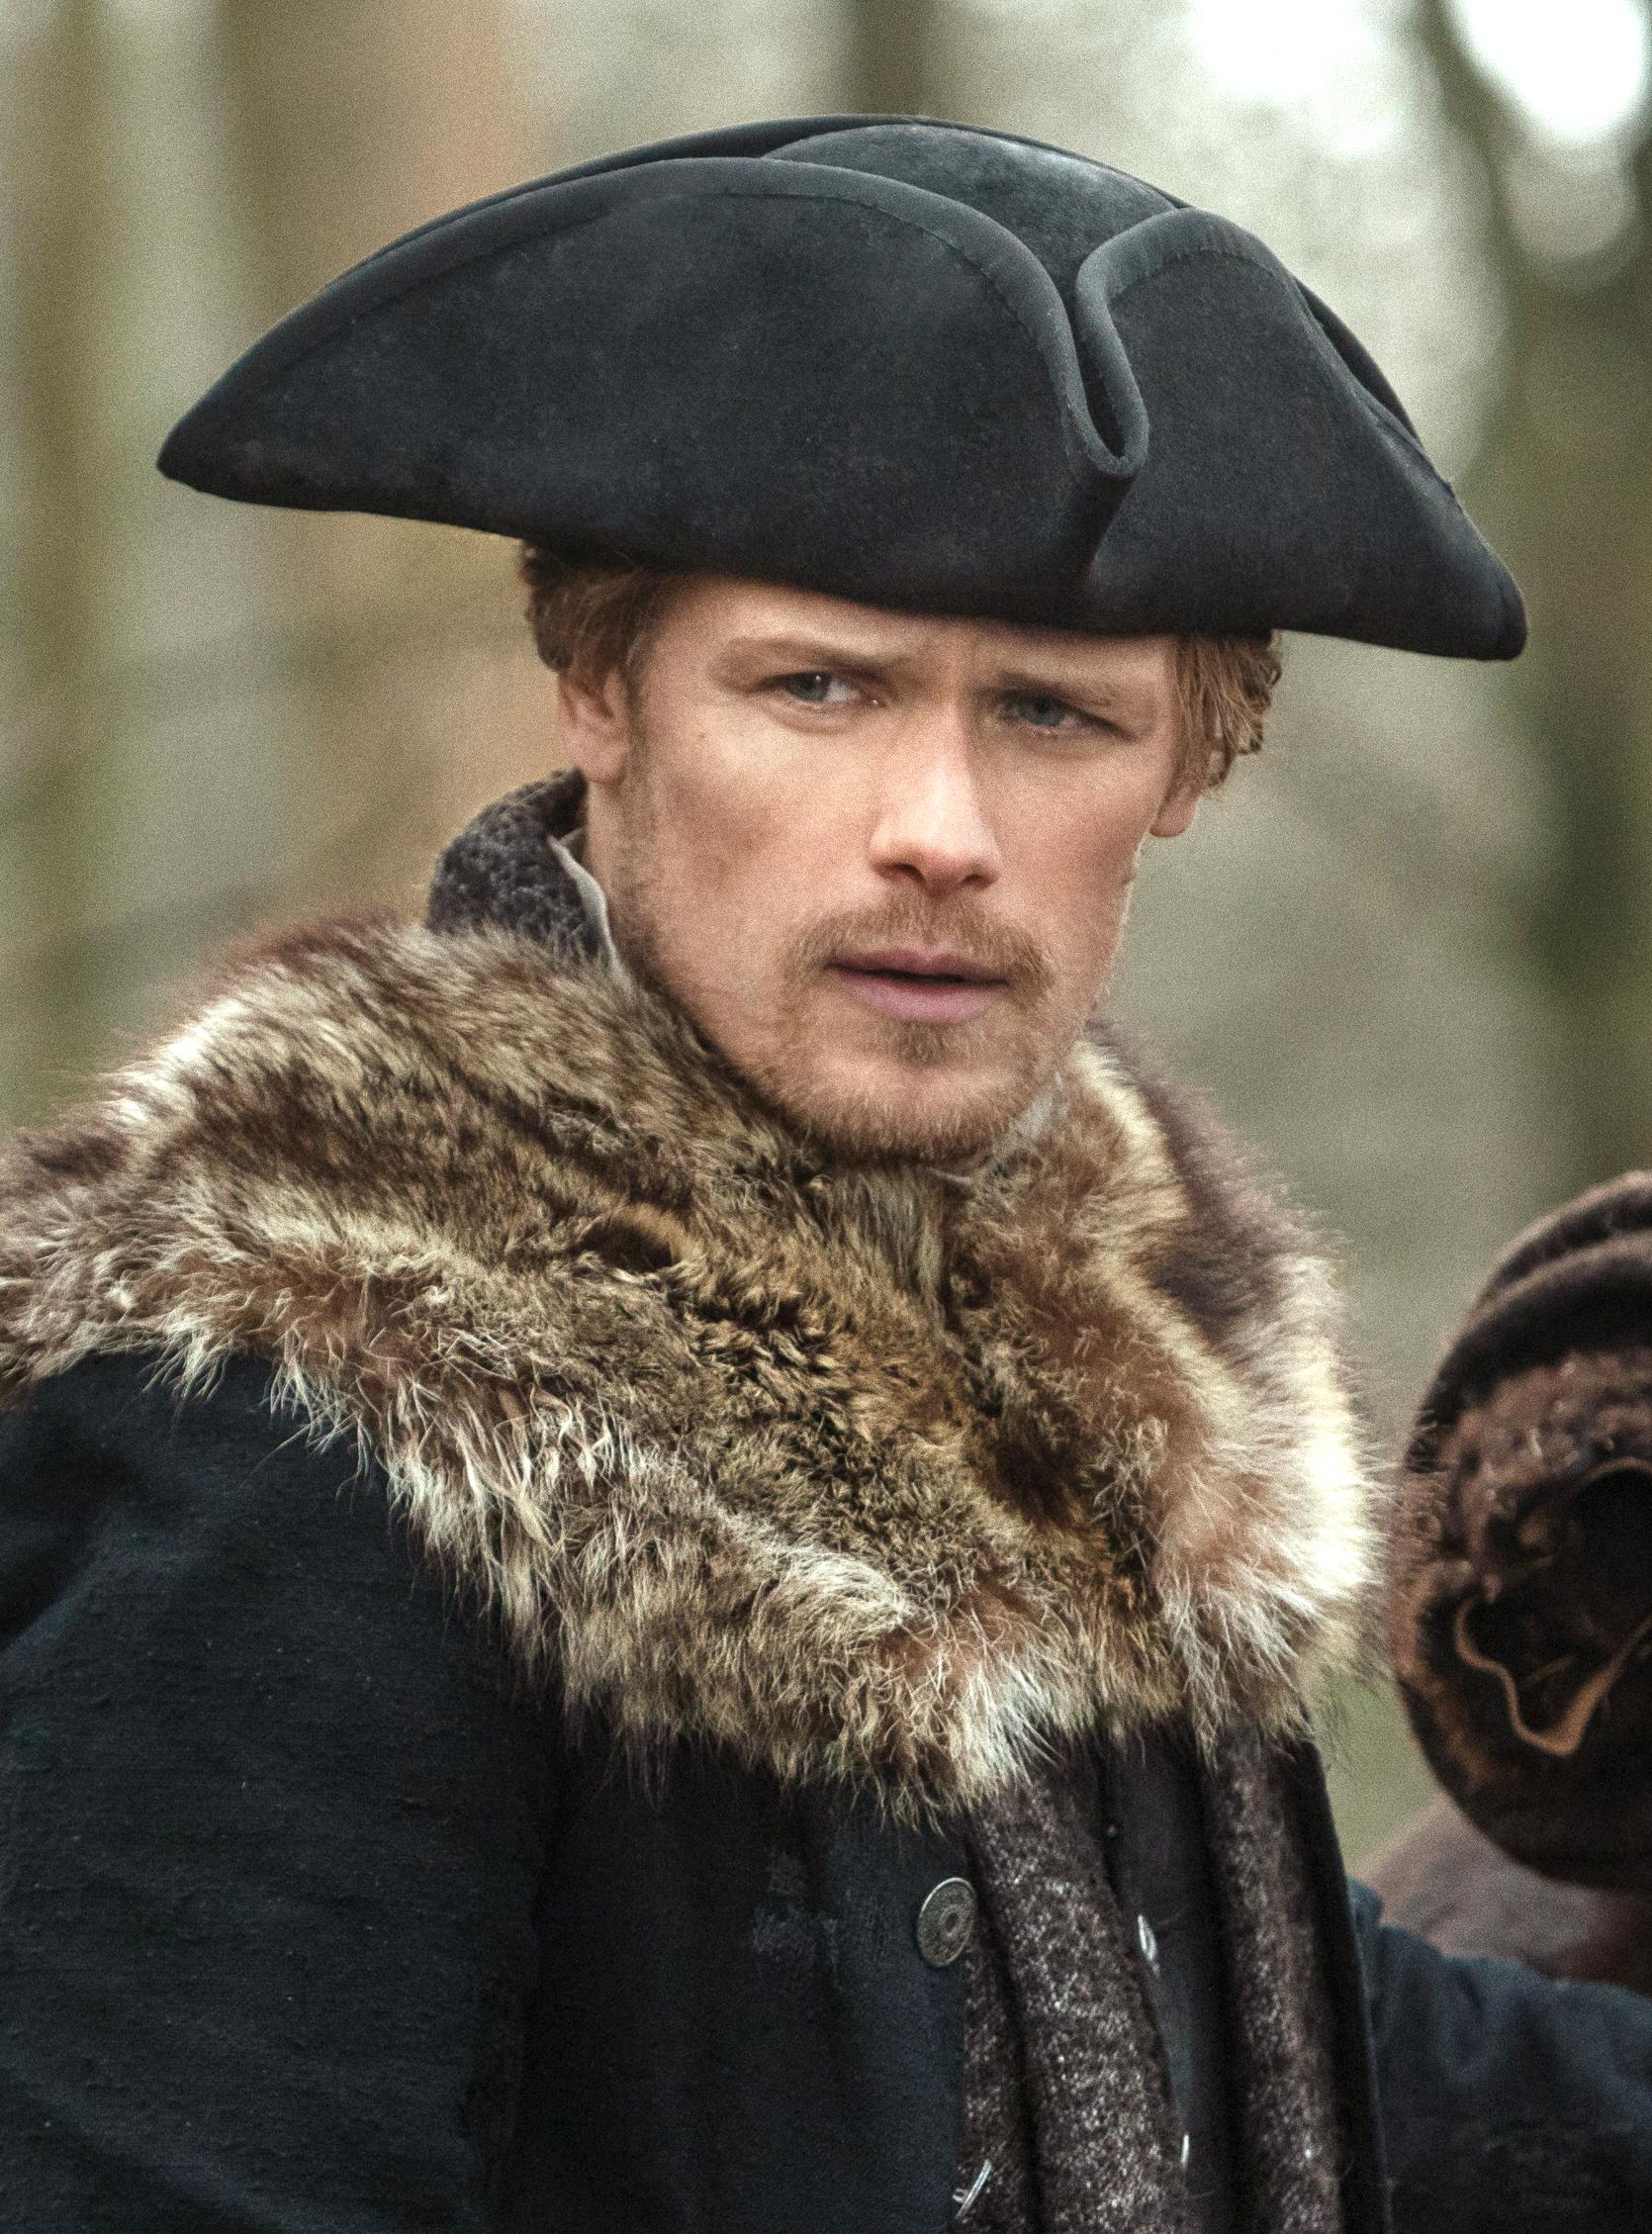 d22e7fddbbc James Fraser | Outlander Wiki | FANDOM powered by Wikia